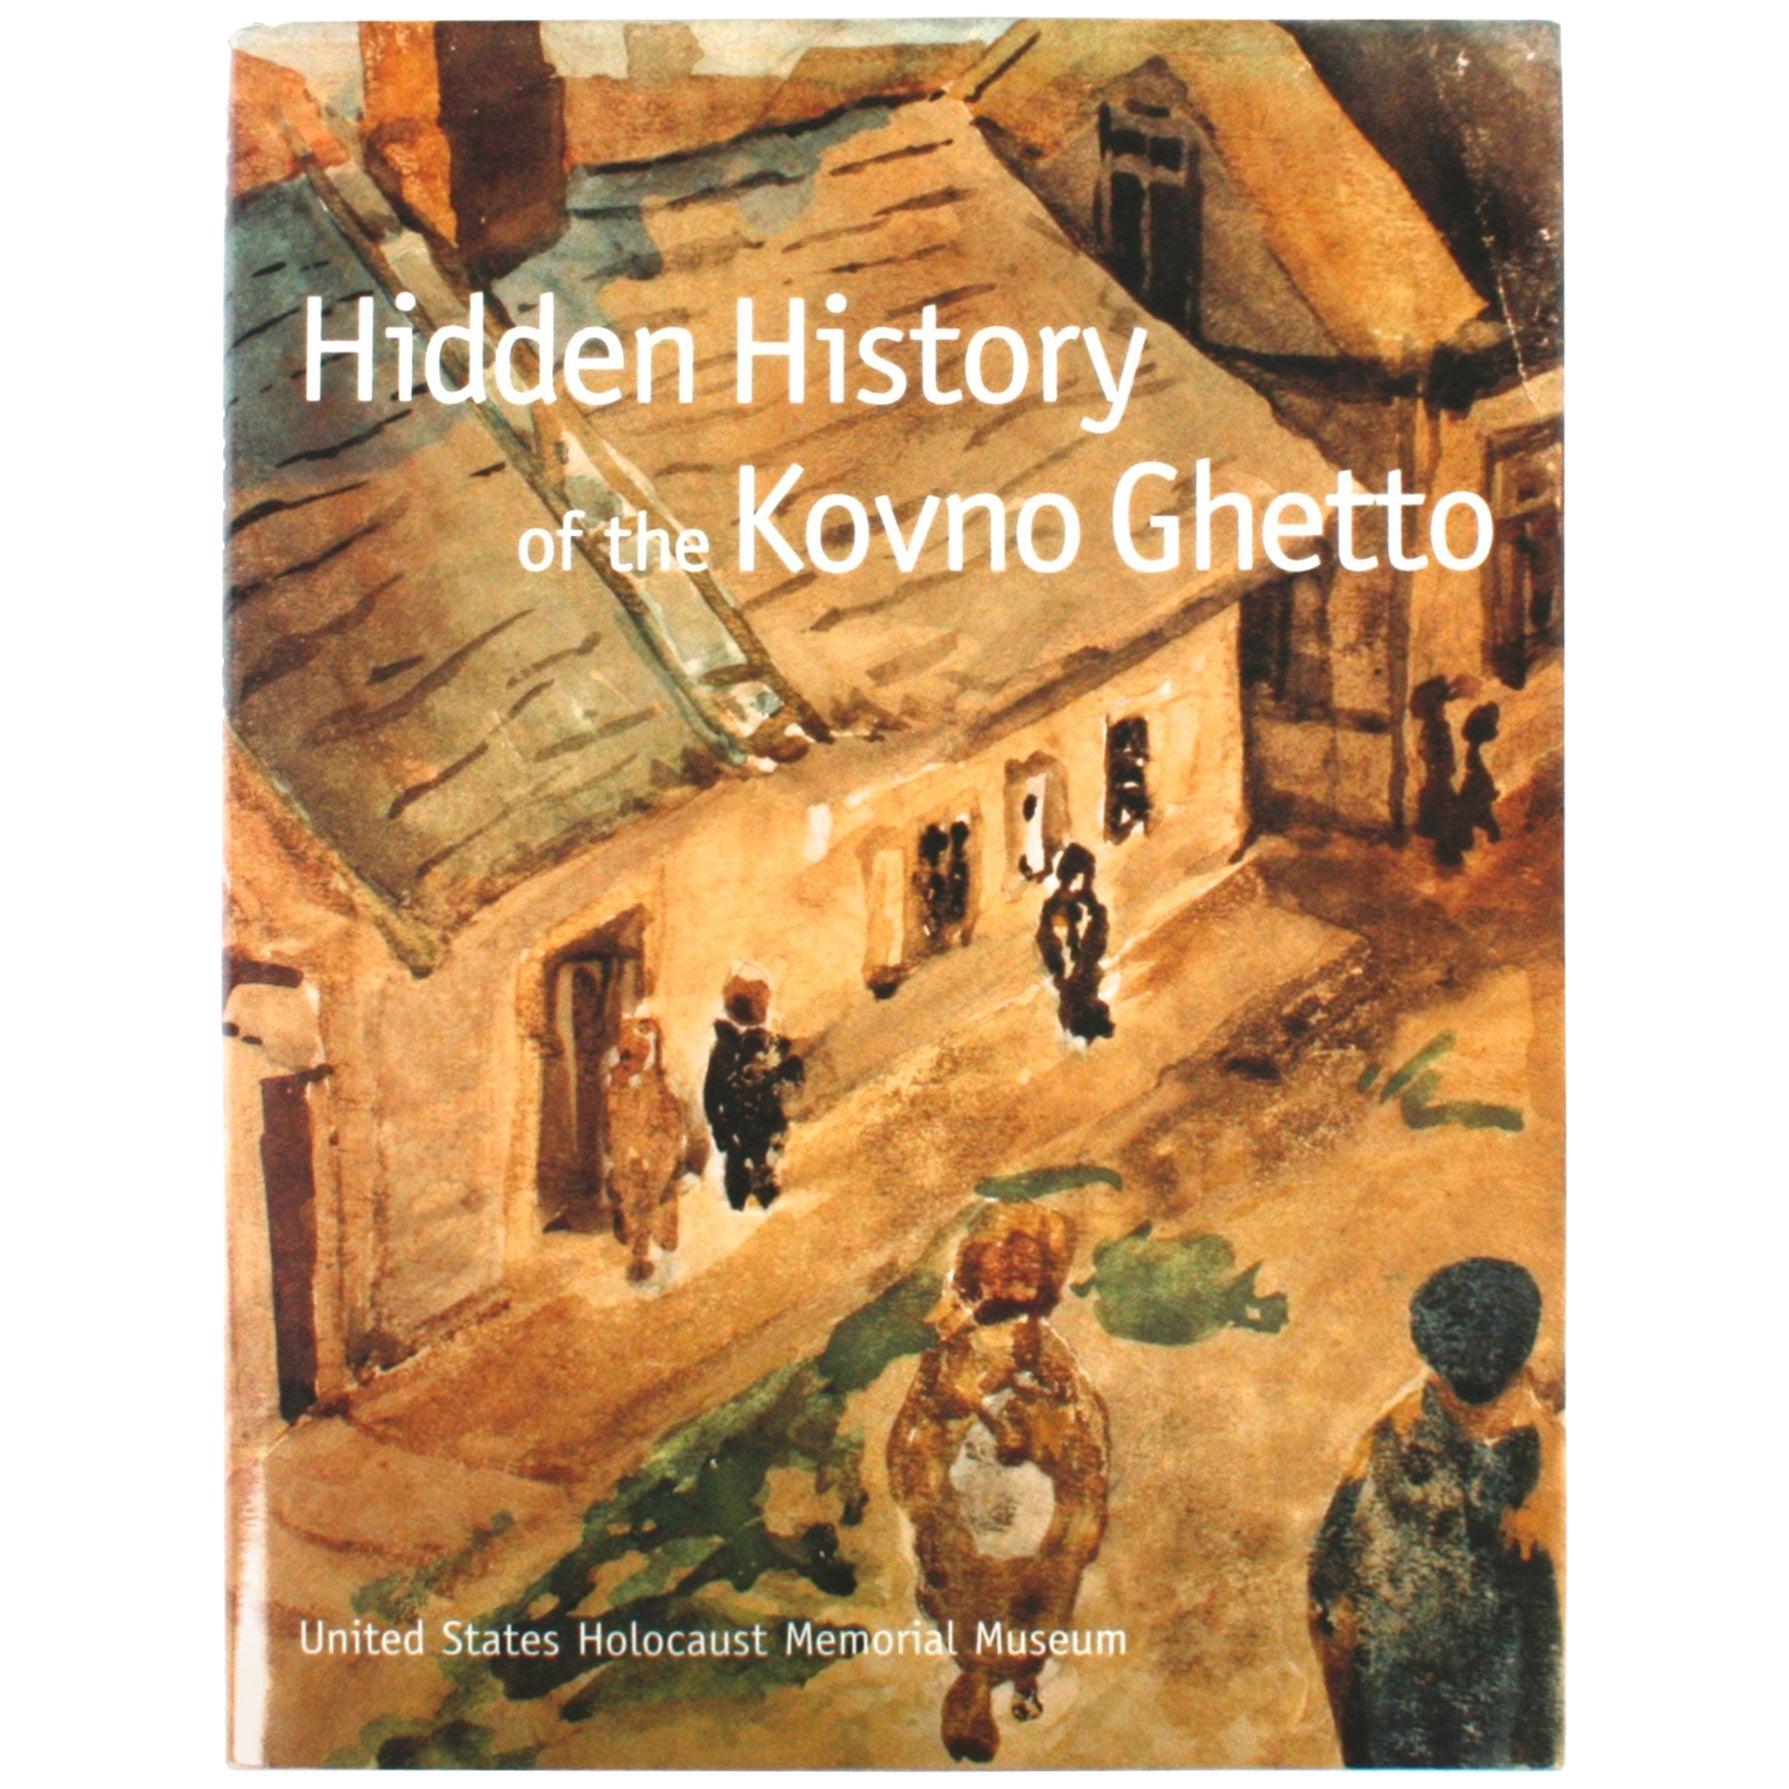 Hidden History of the Kovno Ghetto